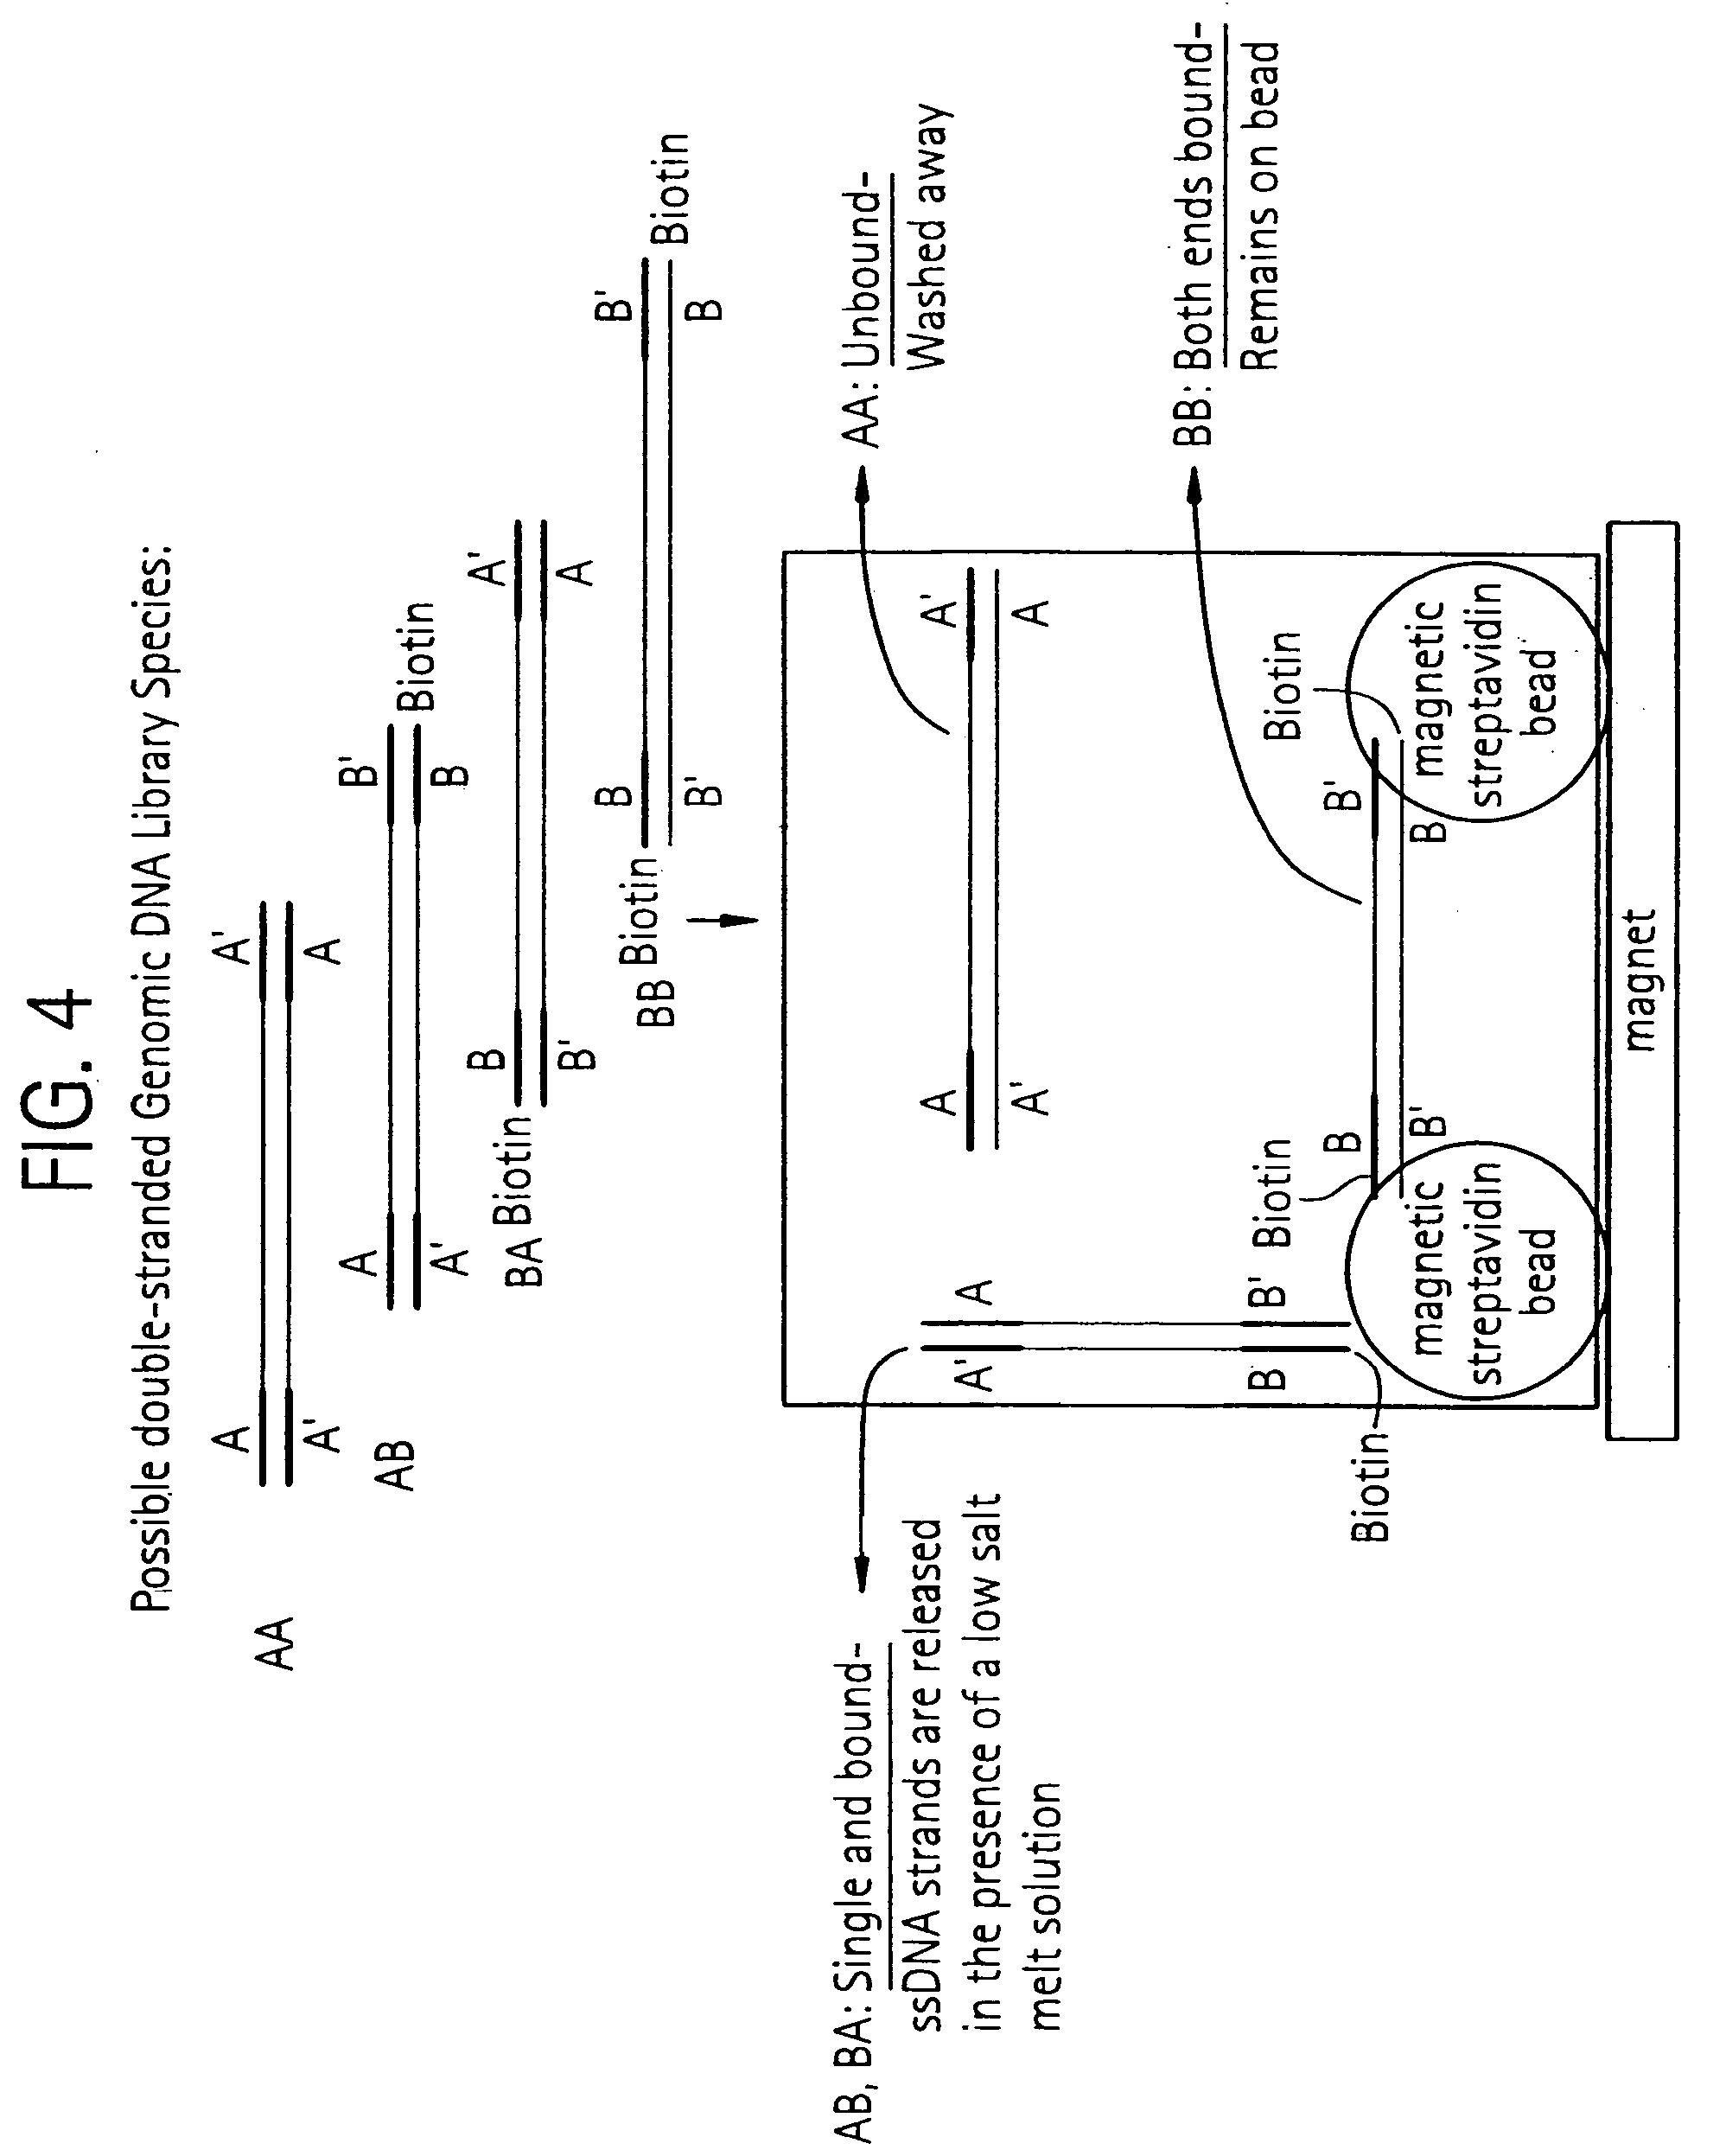 Mars Motor 10587 Wiring Diagram as well Generac 5500 Watt Portable Generator Parts besides Maxon Valve Wiring Diagram besides Lynx Portable 125 Kw Wiring Diagram also Intertherm 7 Wire Thermostat Wiring Diagram. on honeywell 5000 wiring diagram